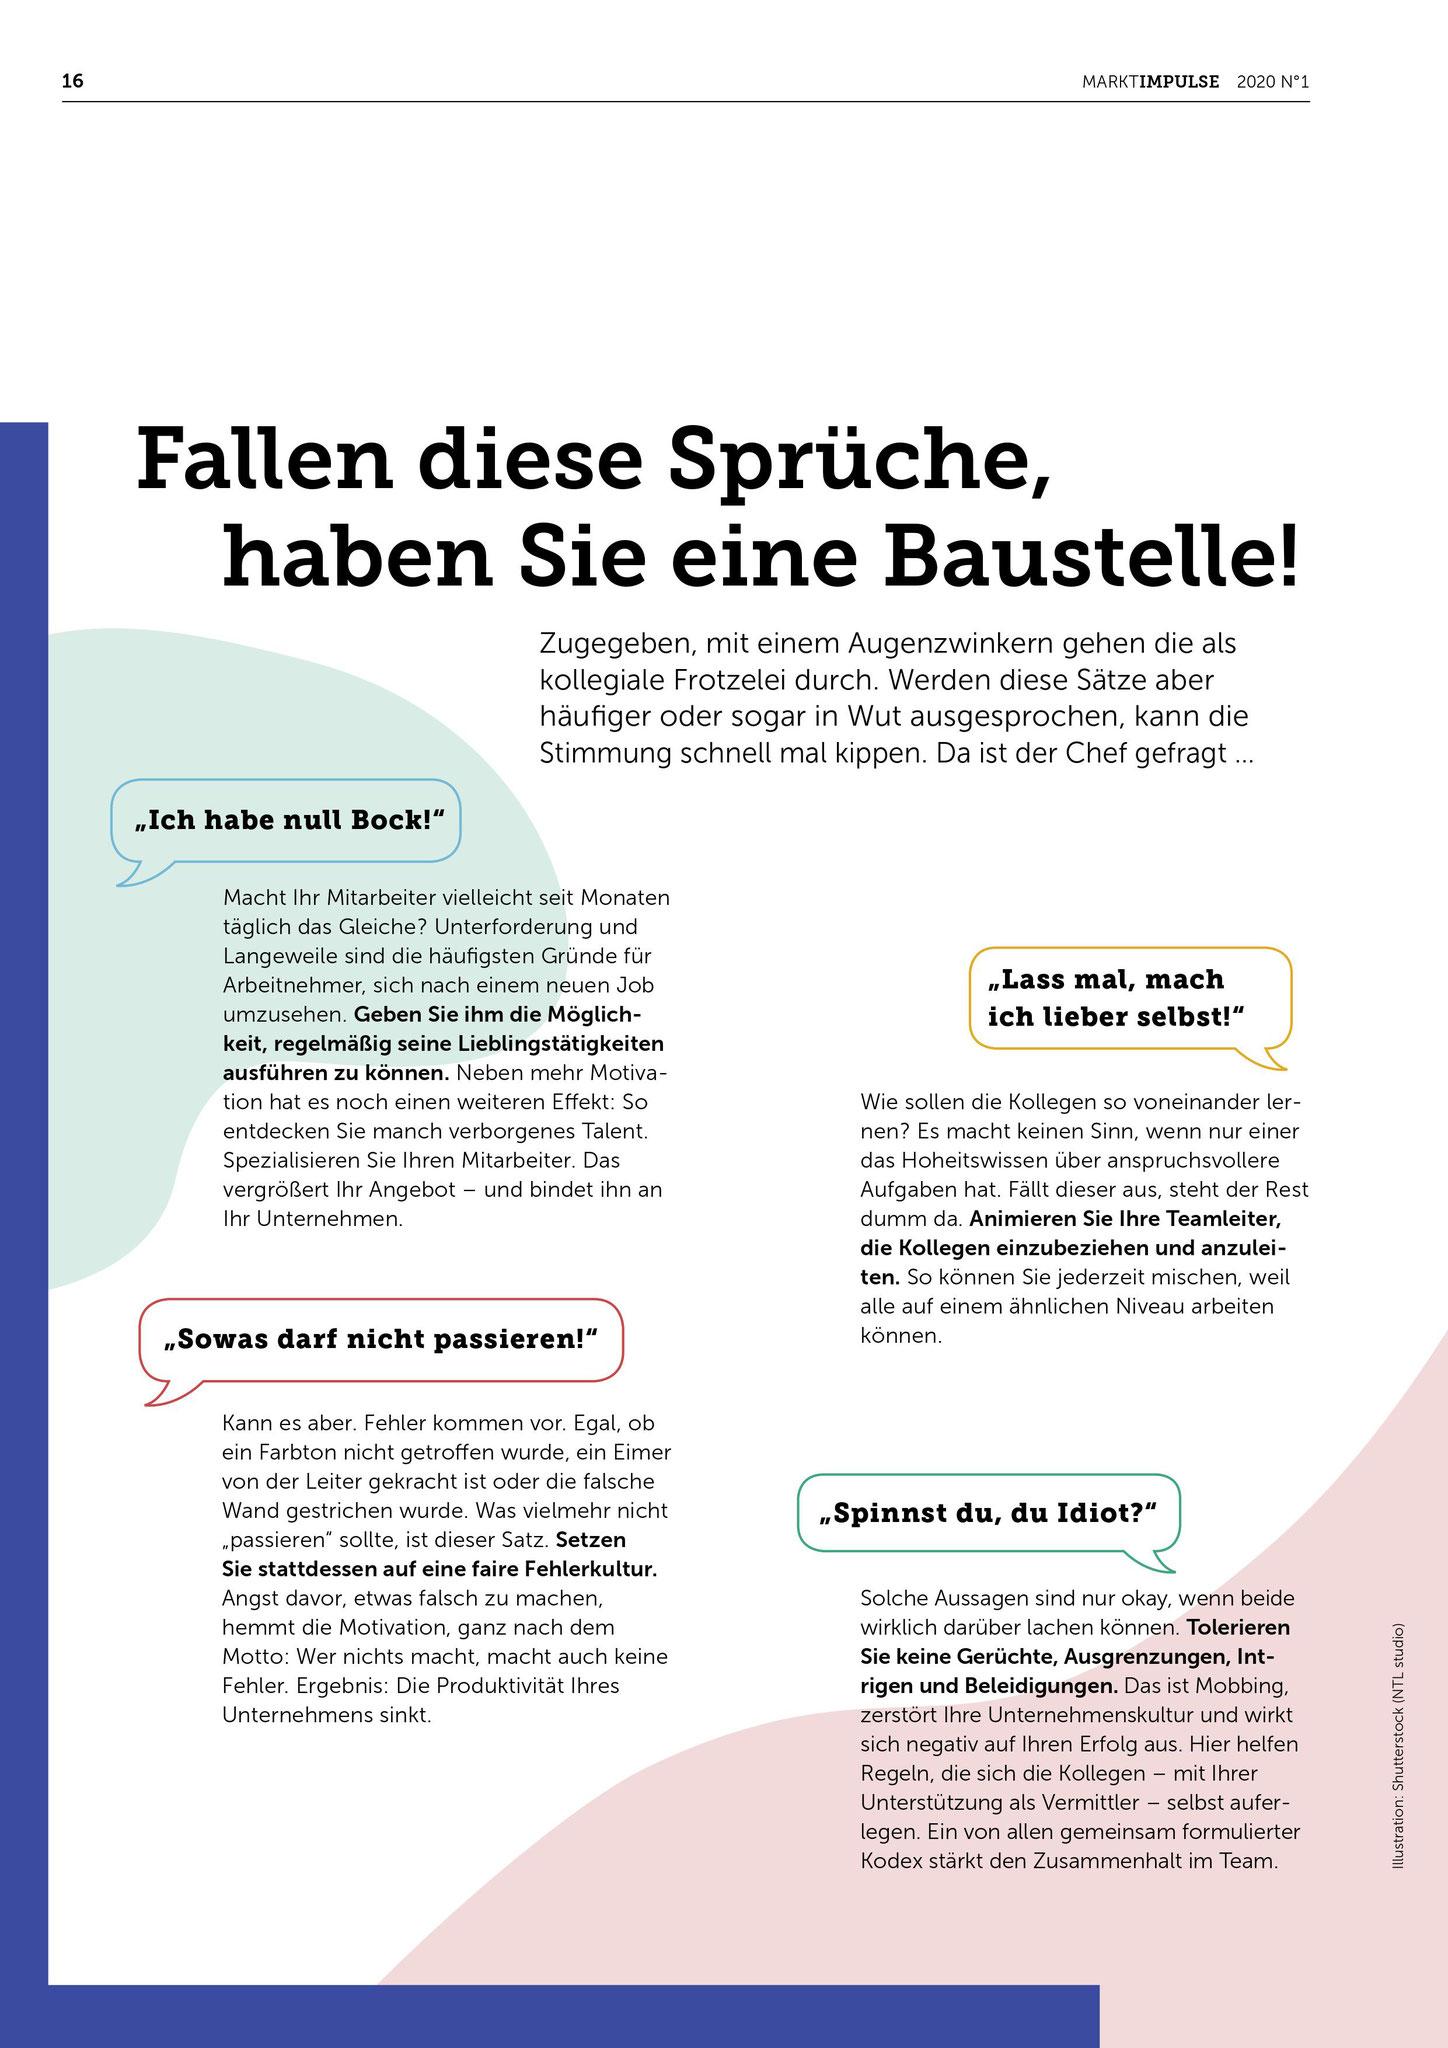 MartIMPULSE 2020 - Generation Brückenbauer